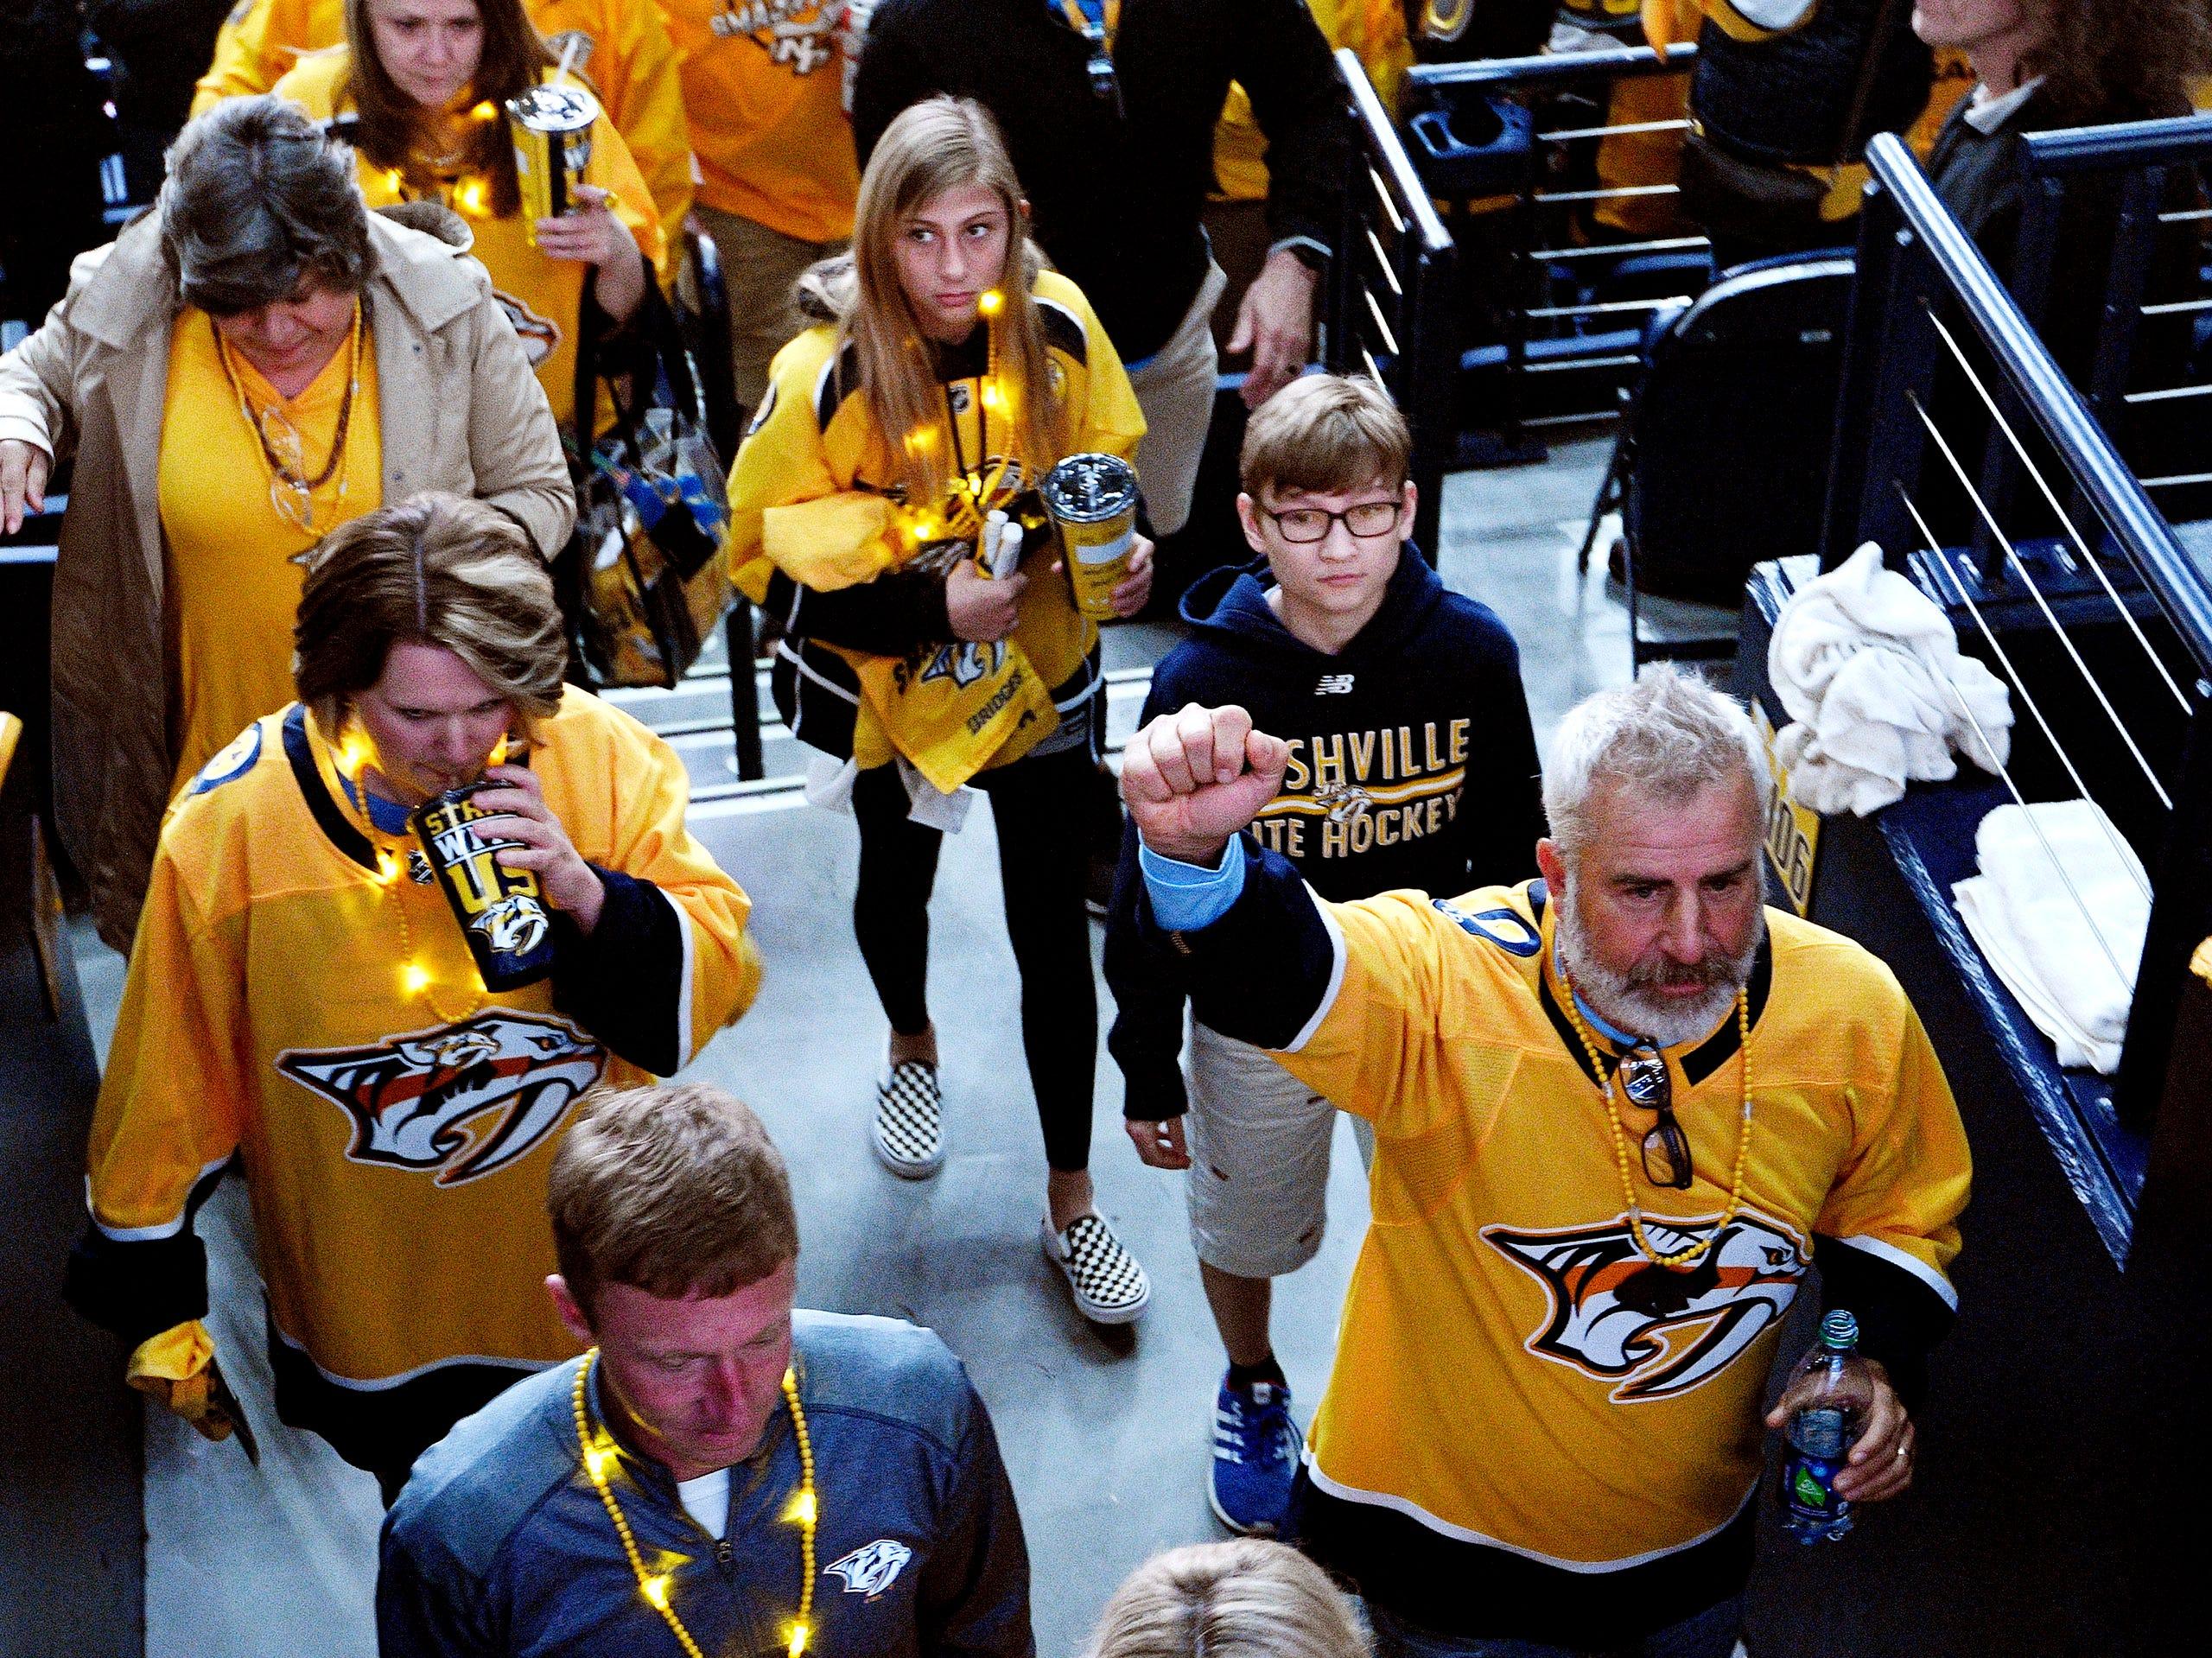 Predators fans celebrate after the 2-1 overtime win over the Dallas Stars in the divisional semifinal game at Bridgestone Arena in Nashville, Tenn., Saturday, April 13, 2019.